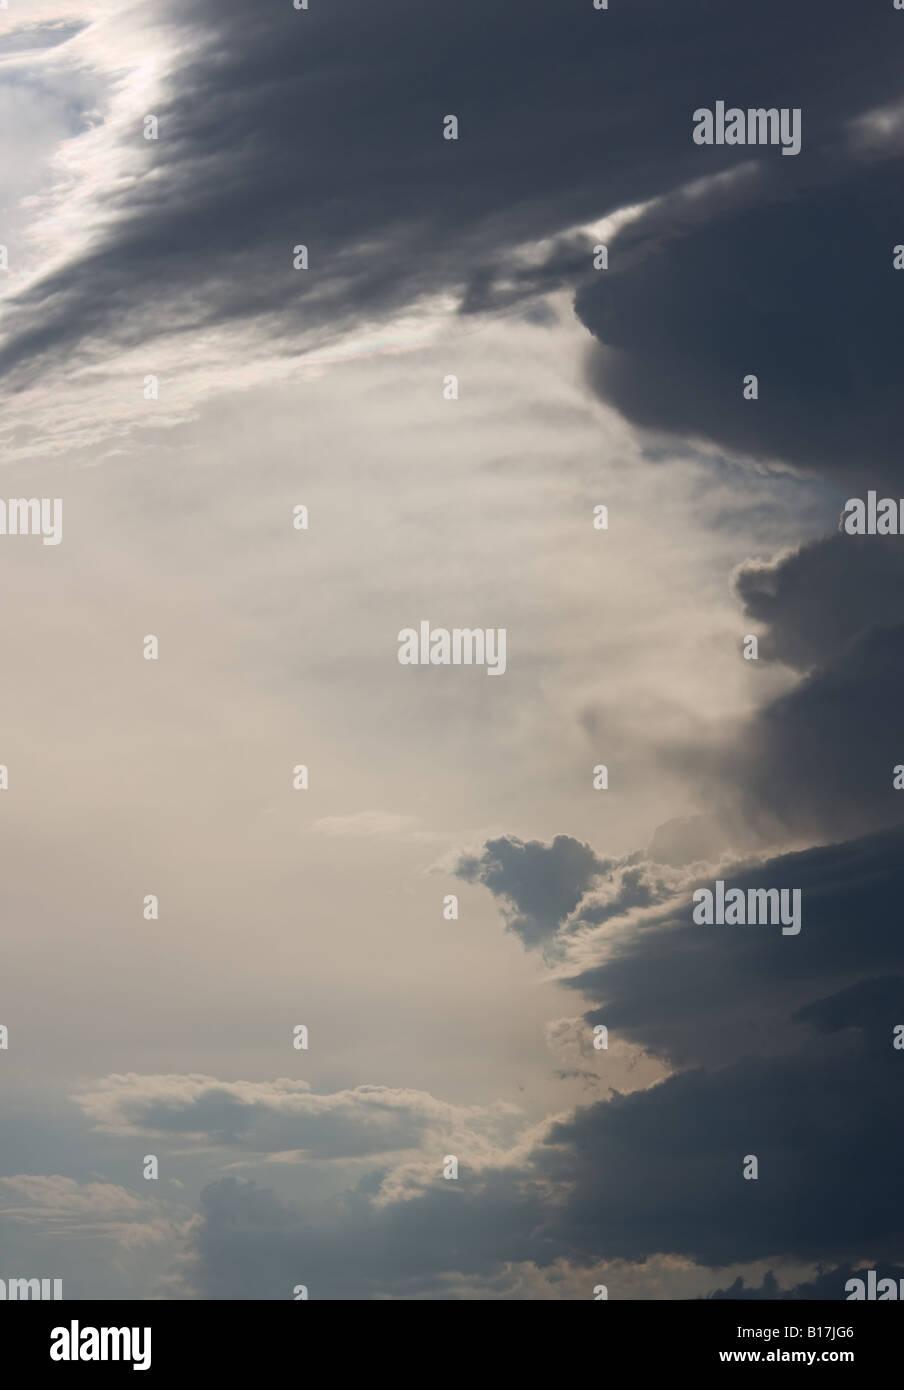 Evening cumulonimbus clouds with developing thunderstorm - Stock Image